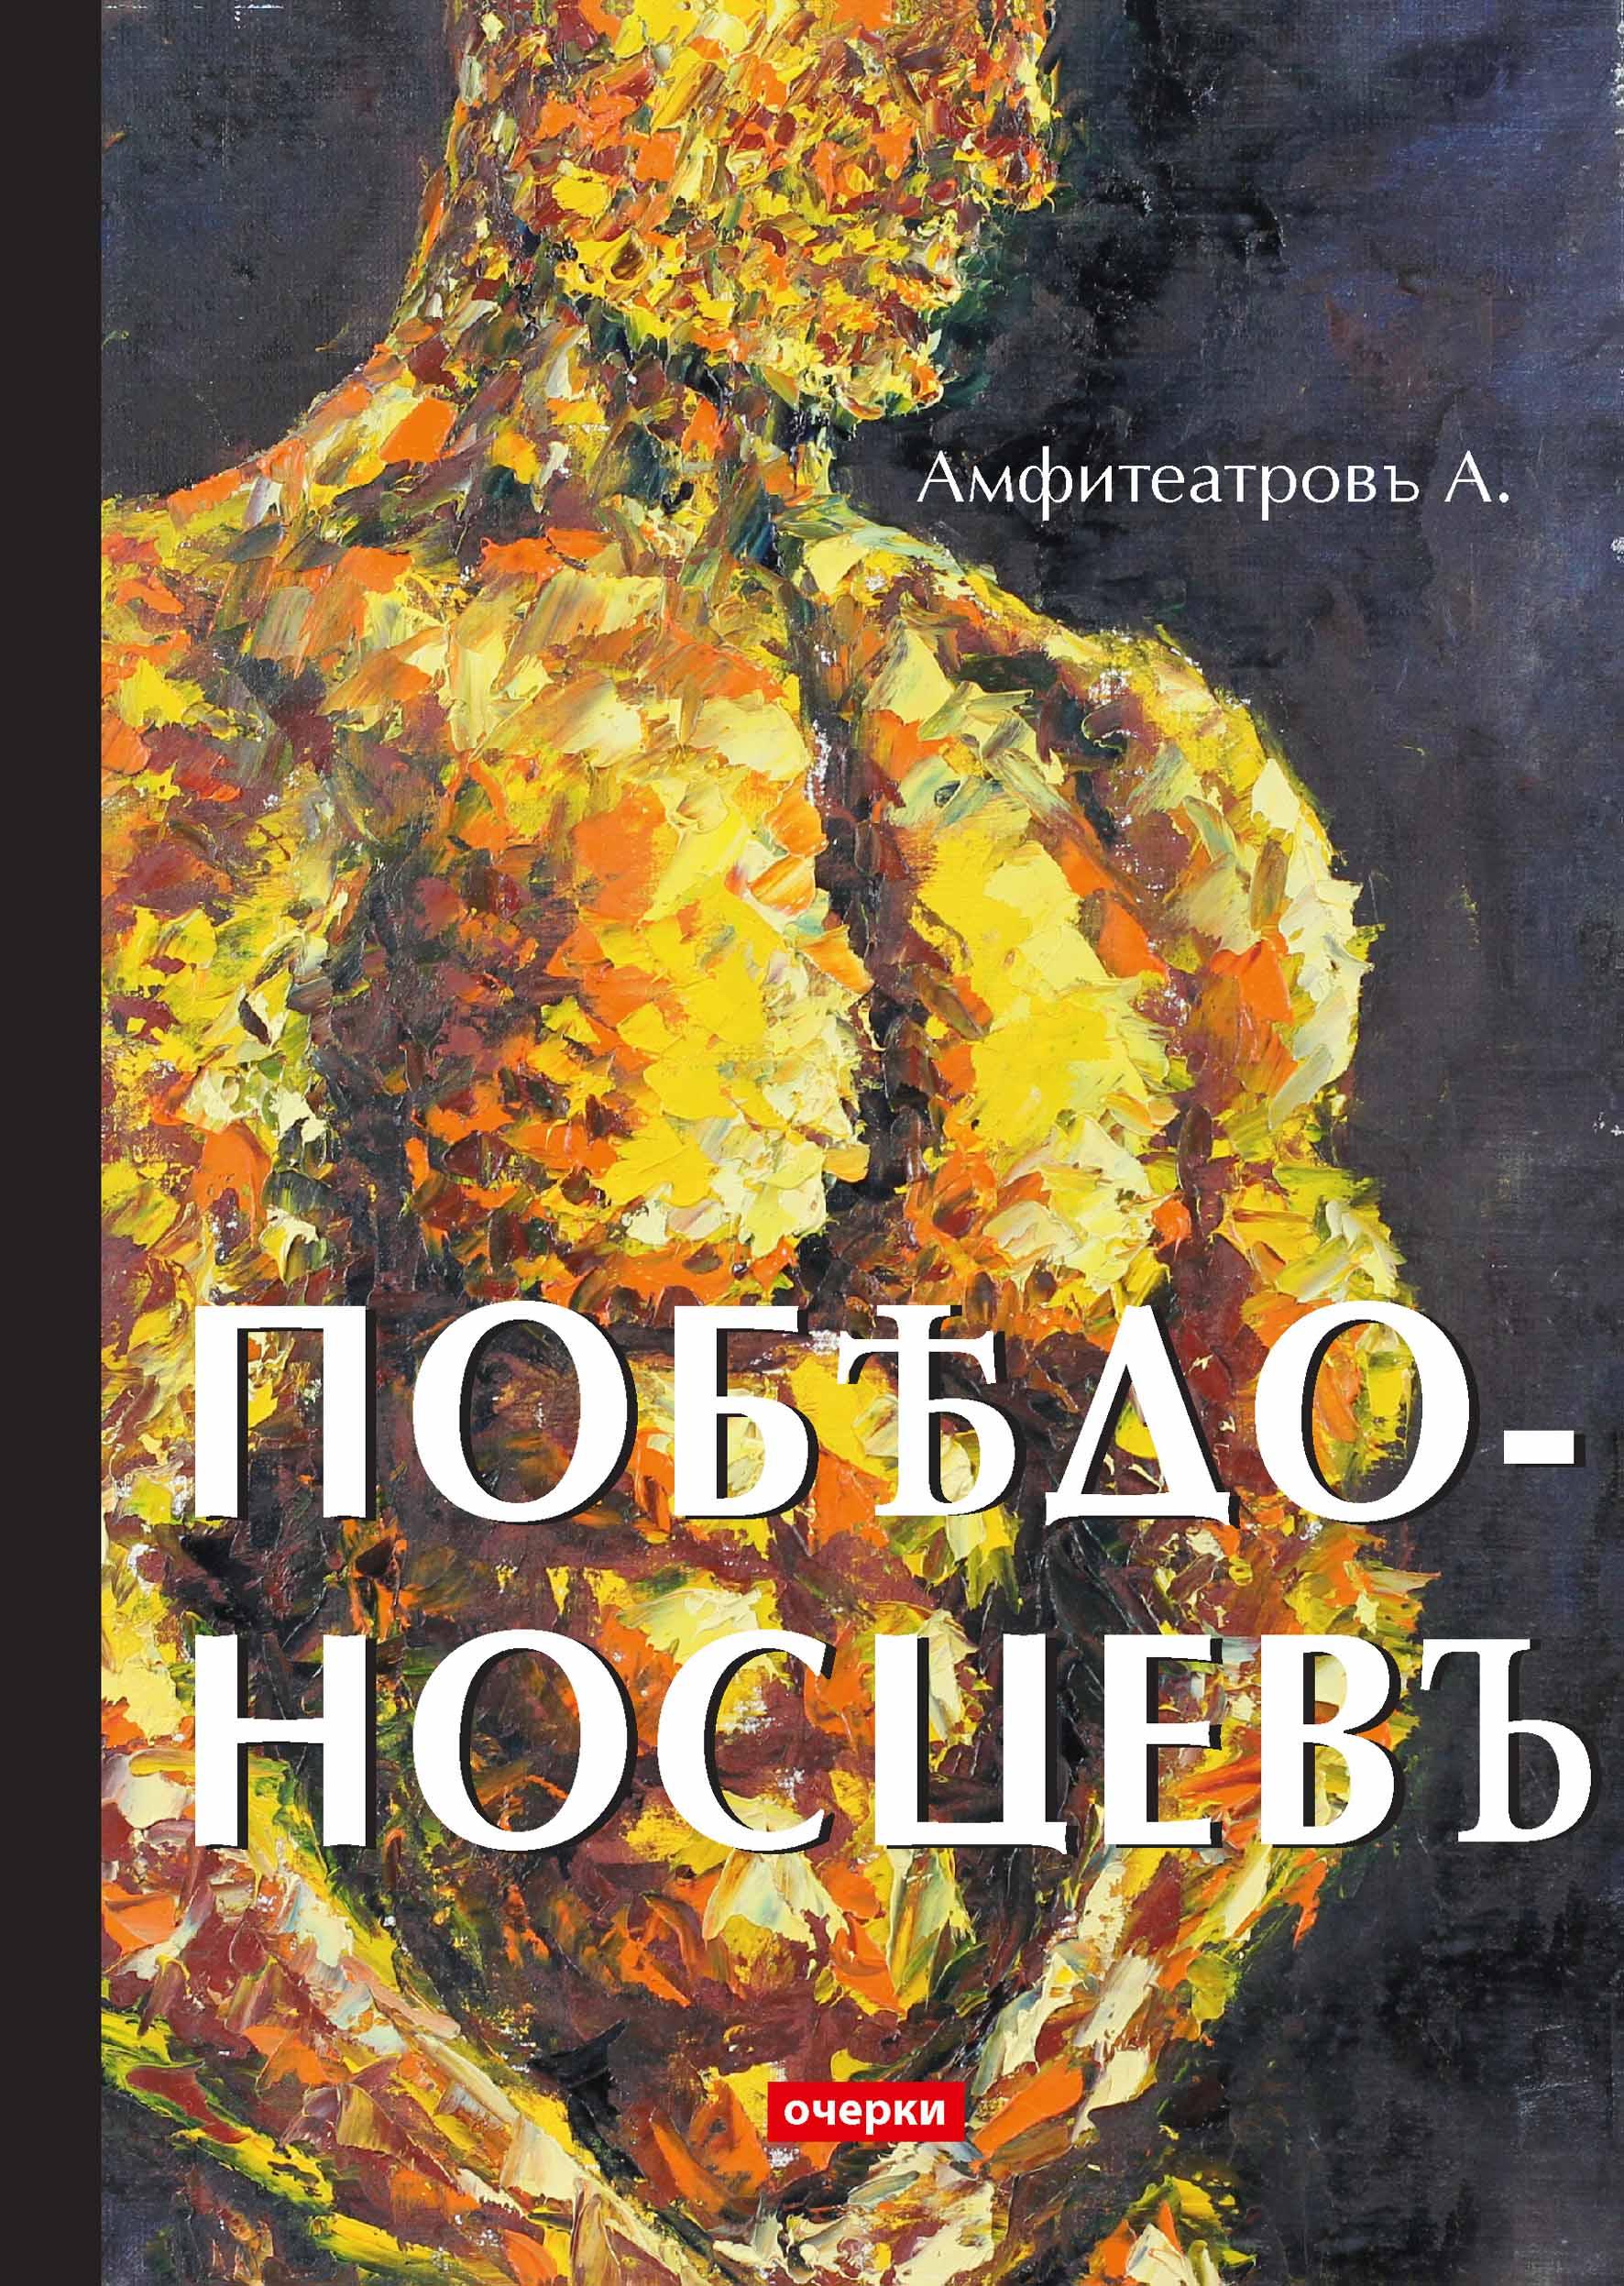 Александр Амфитеатров Победоносцевъ а в амфитеатров мертвые боги